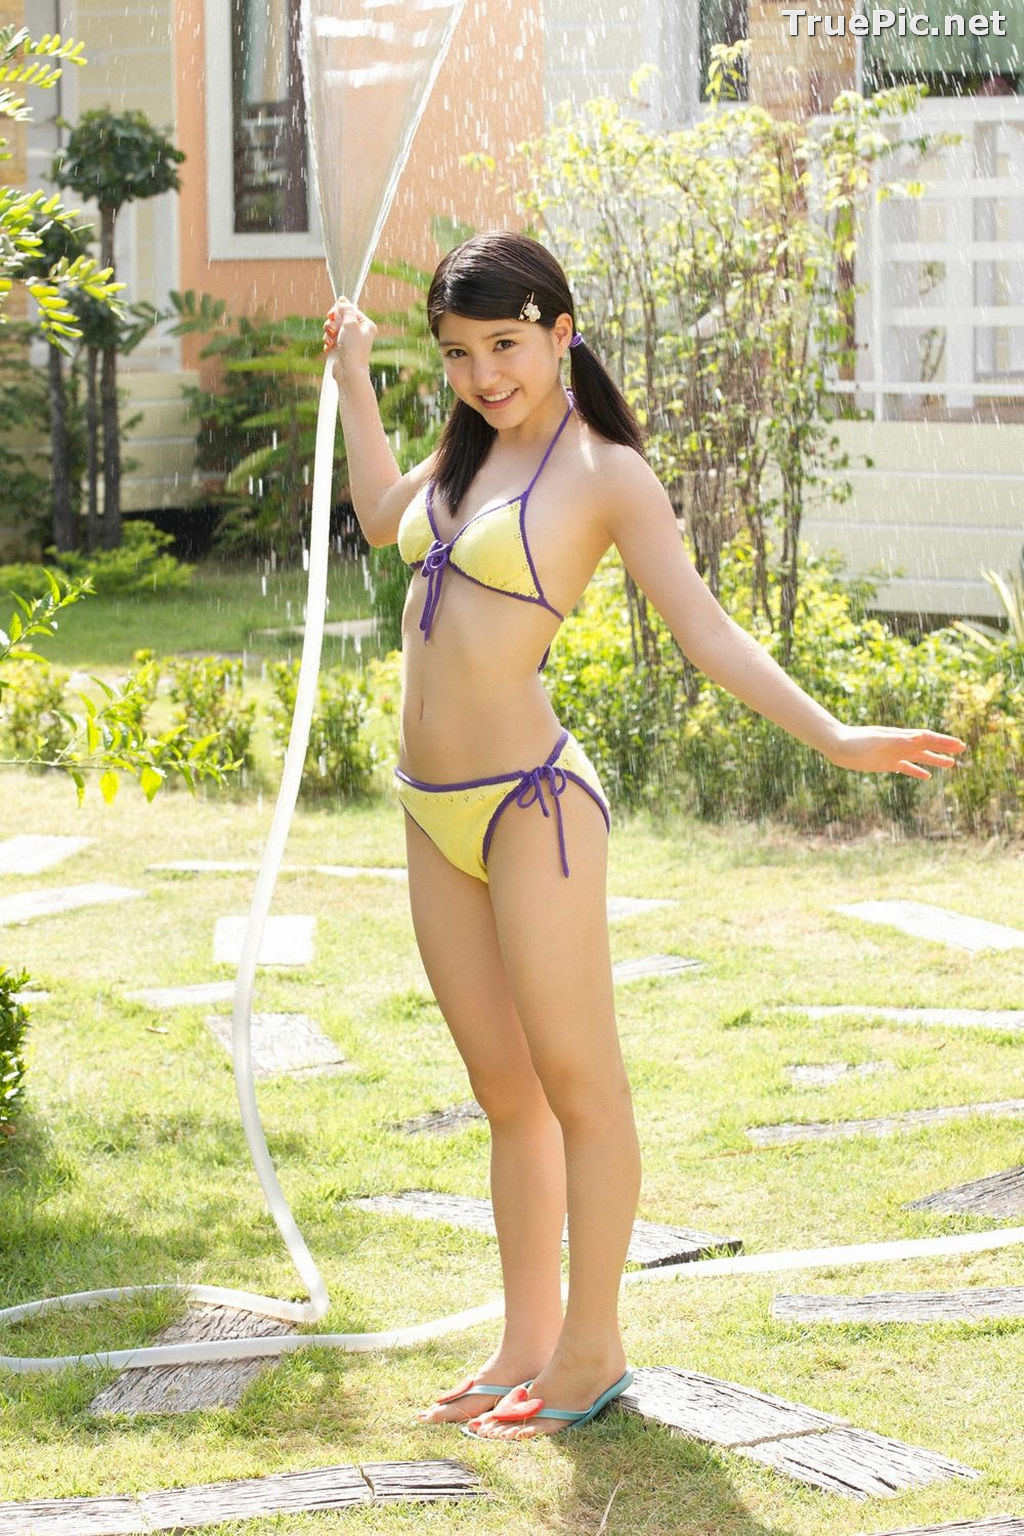 Image [YS Web] Vol.506 - Japanese Actress and Singer - Umika Kawashima - TruePic.net - Picture-19